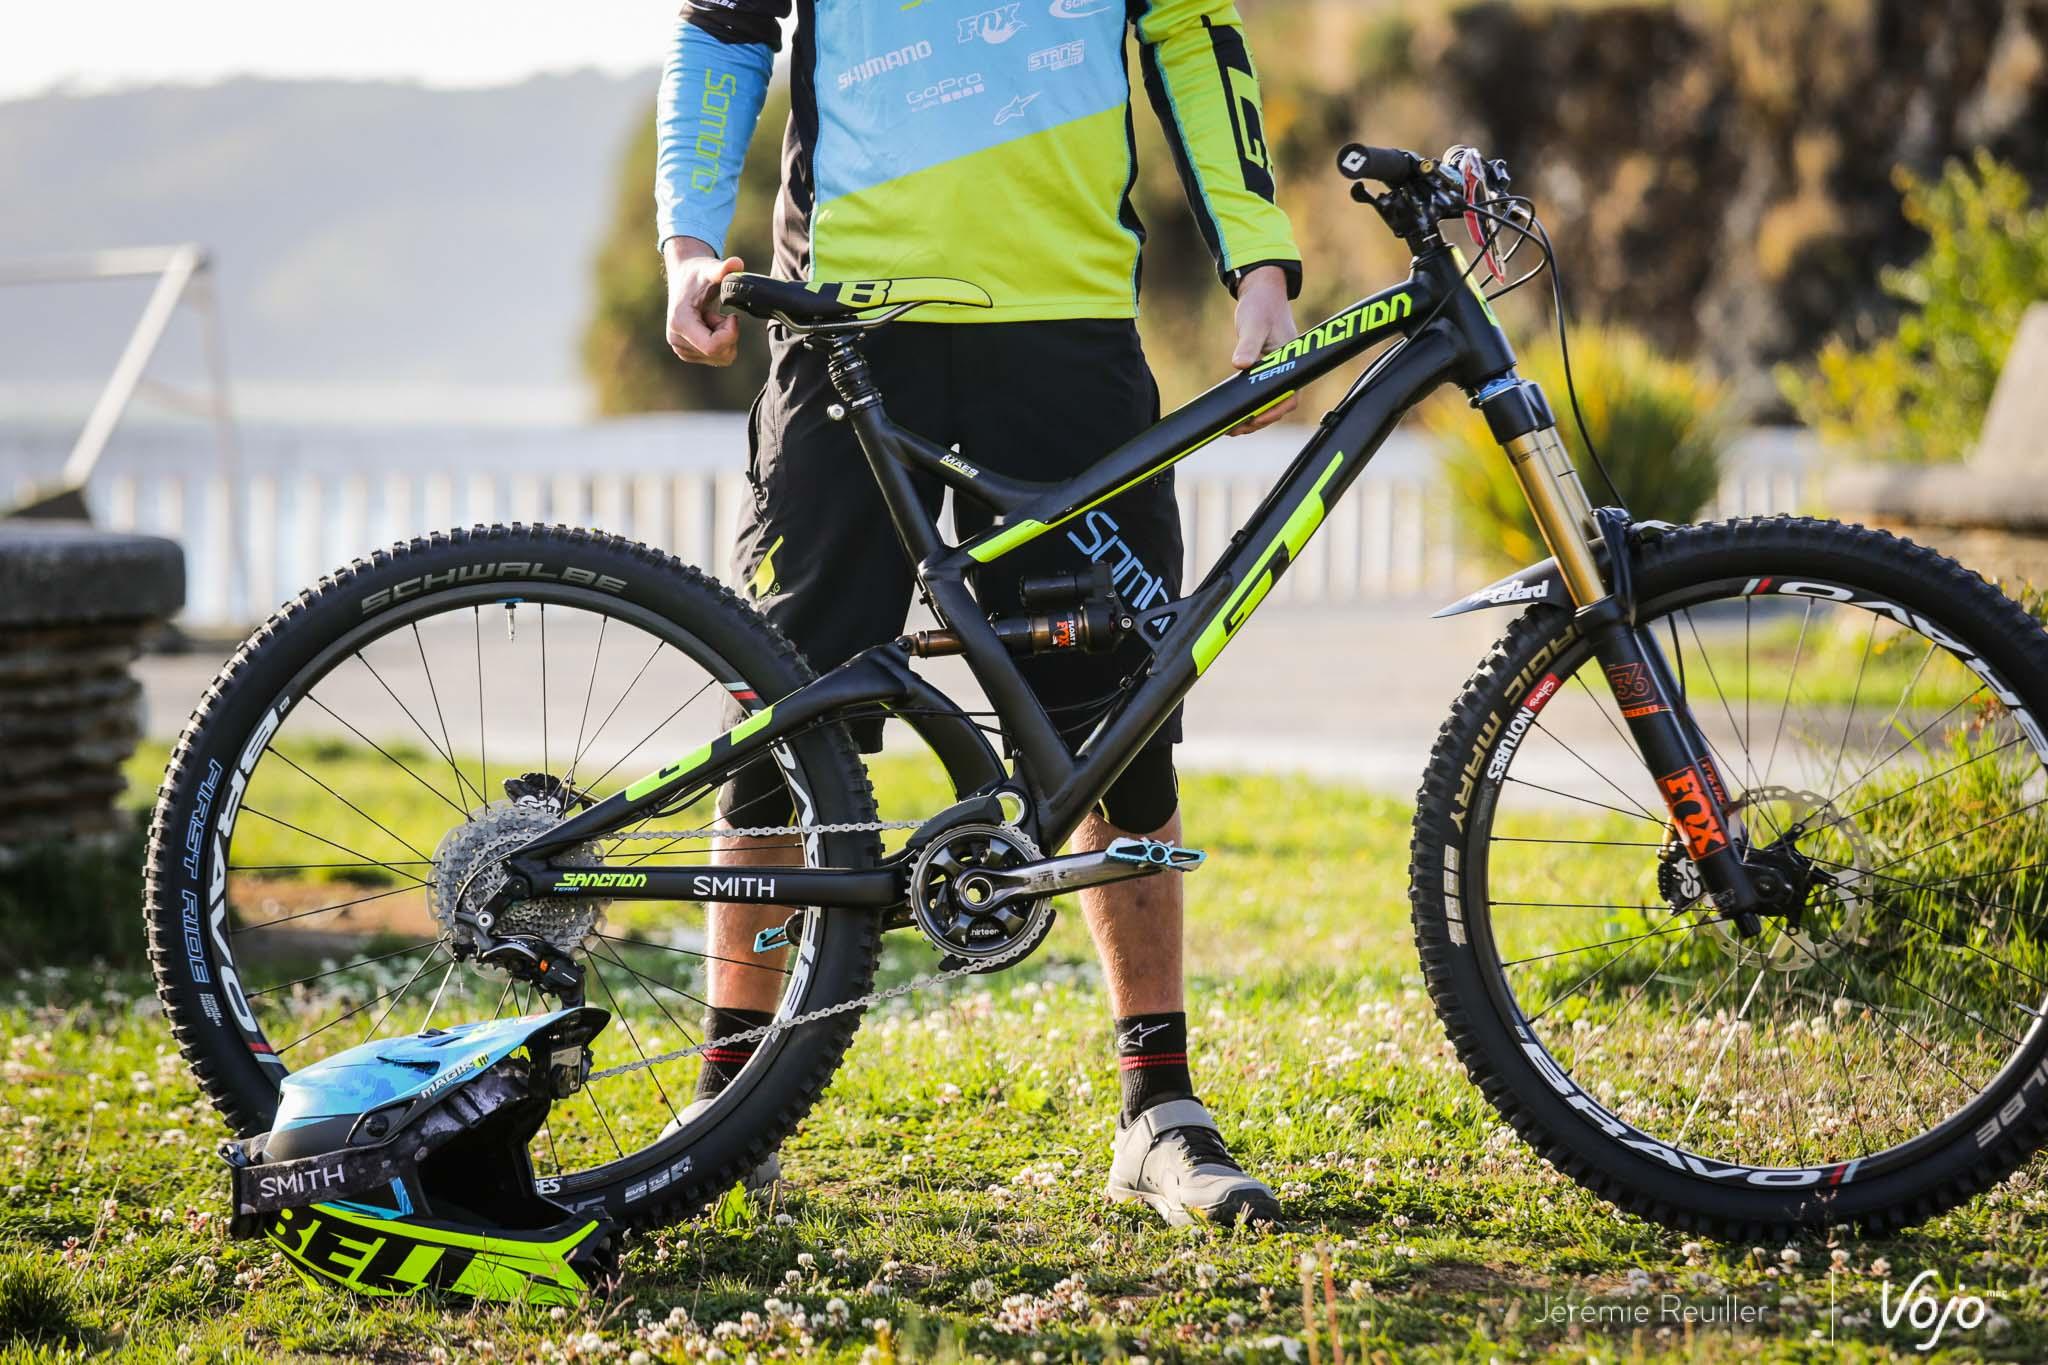 Bike_Check_EWS_Martin_Maes_Copyright_Reuiller_Vojomag-1-2